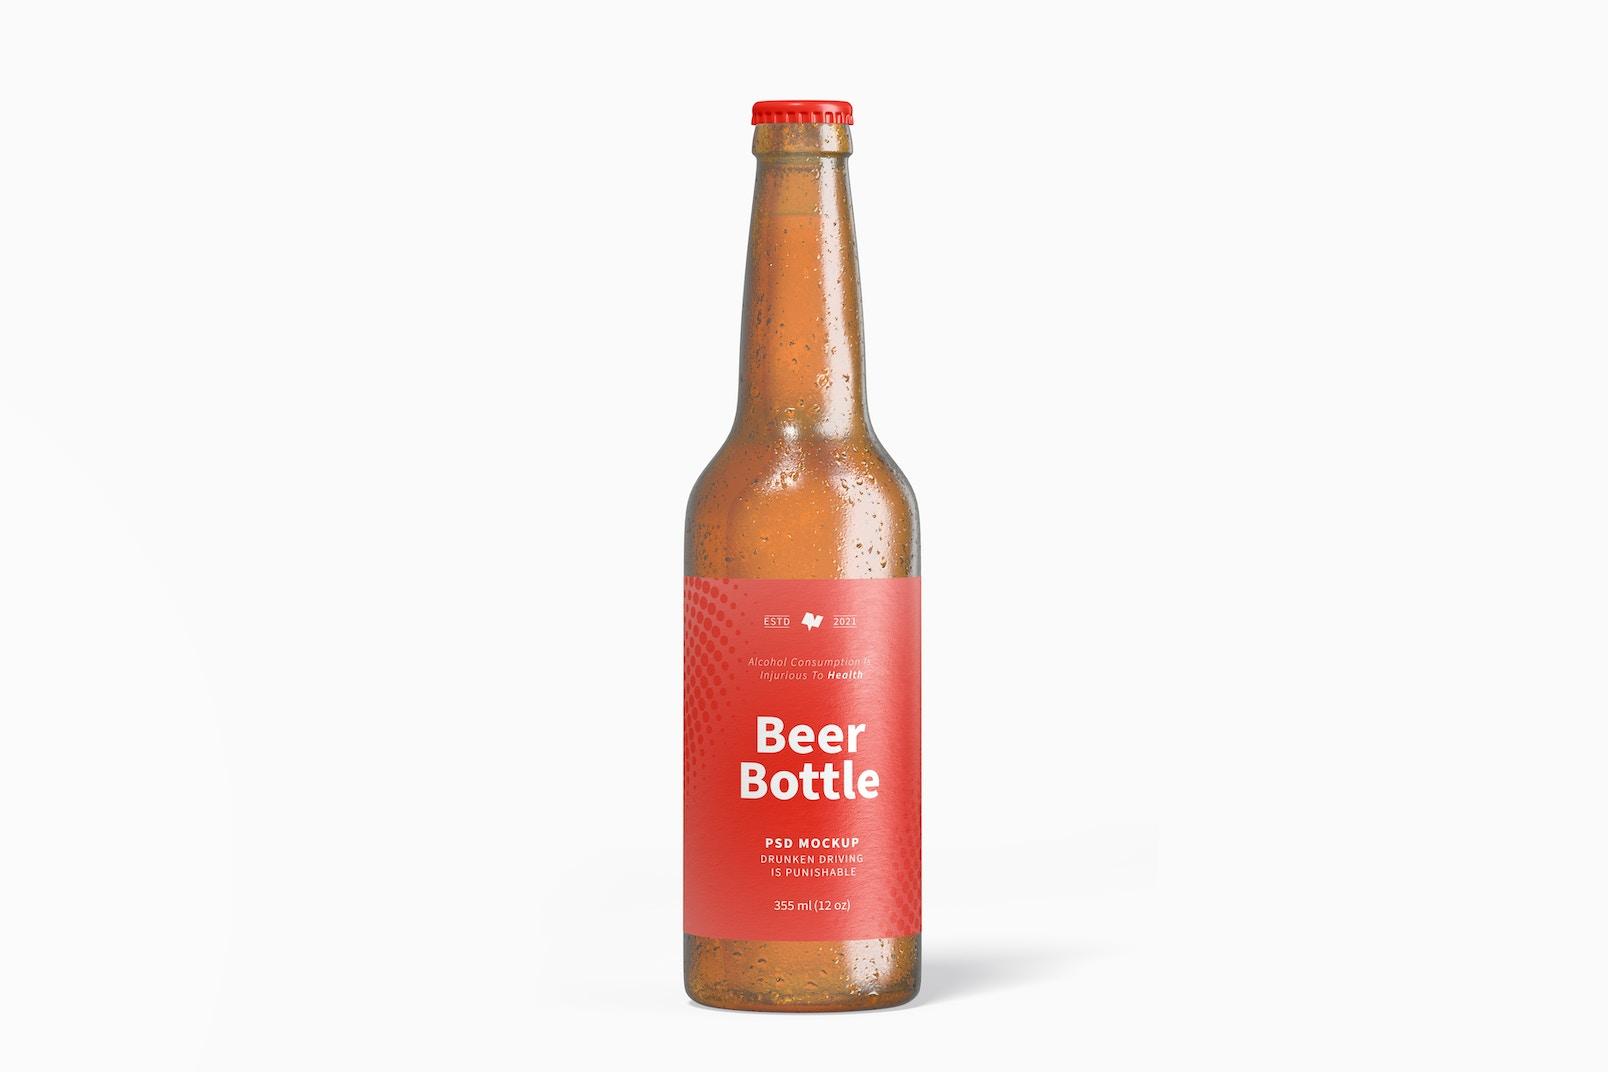 Beer Bottle Mockup, Front View